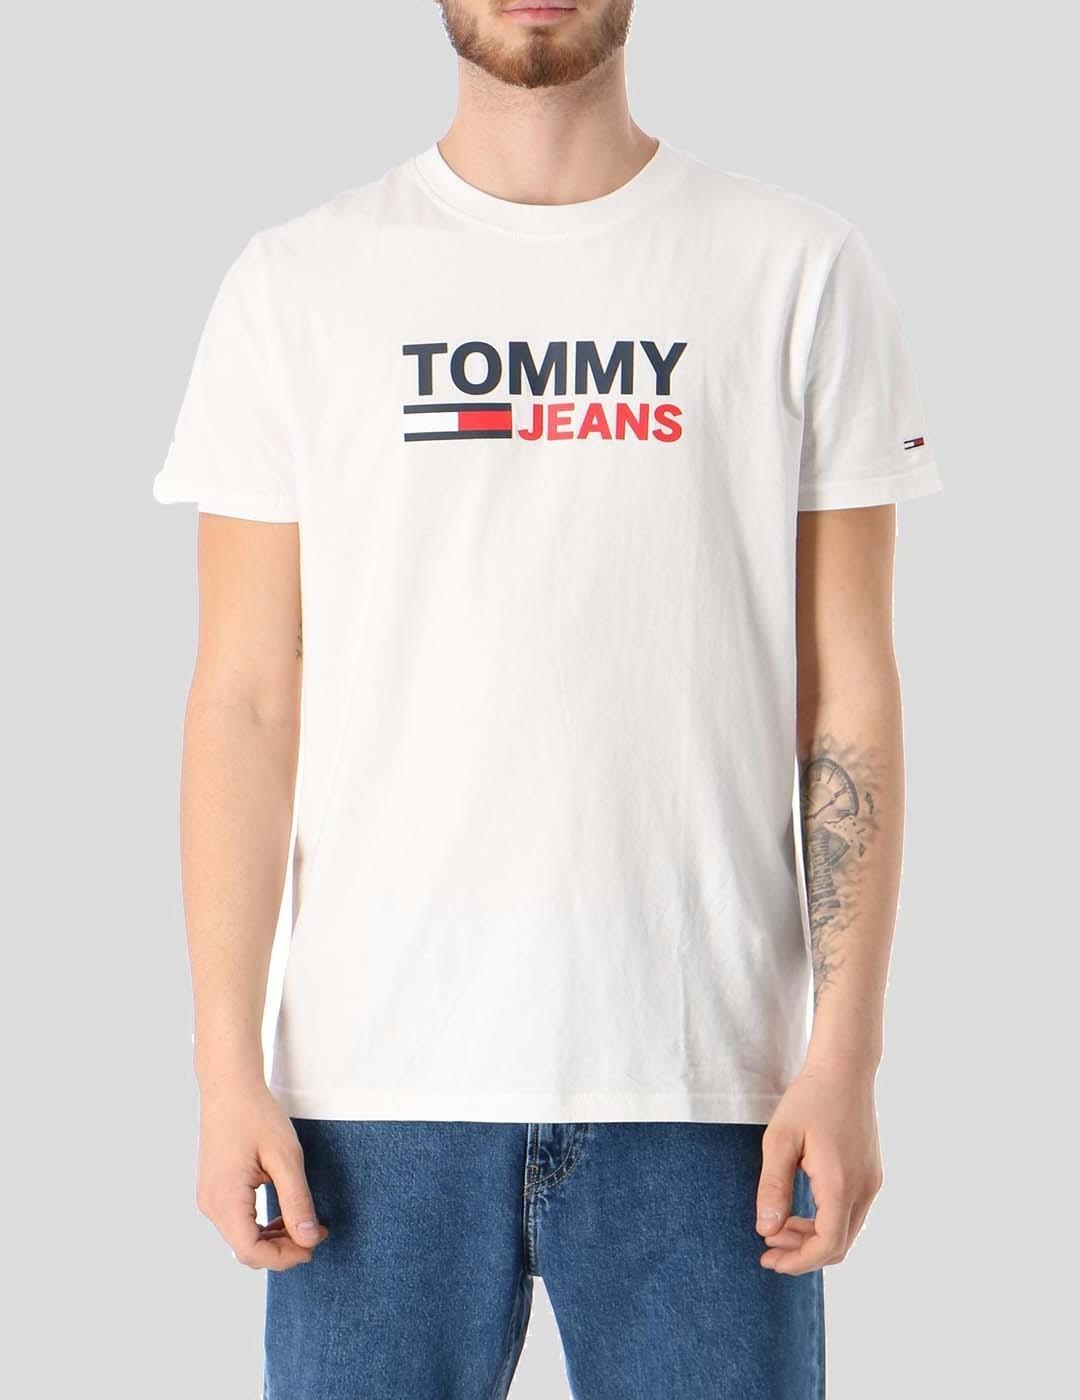 CAMISETA TOMMY JEANS CORP LOGO TEE WHITE